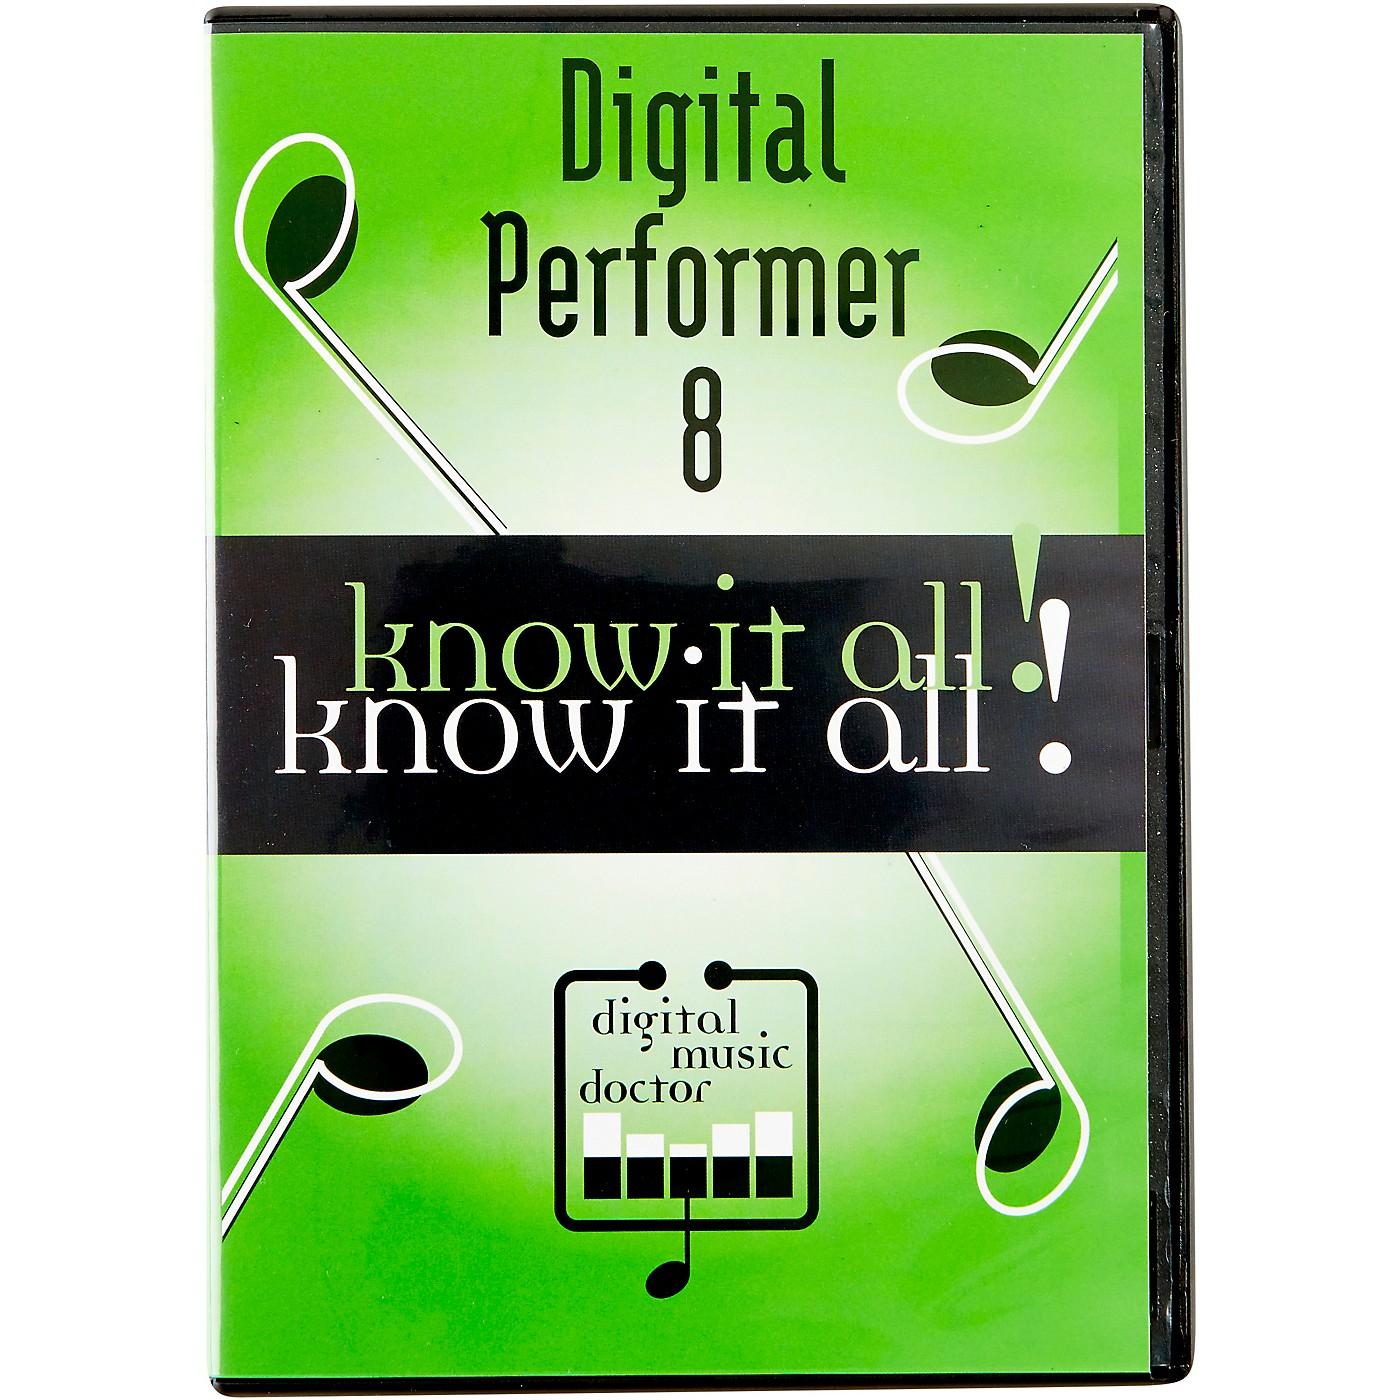 Digital Music Doctor MOTU Digital Performer 8 Know It All! Video Tutorial thumbnail